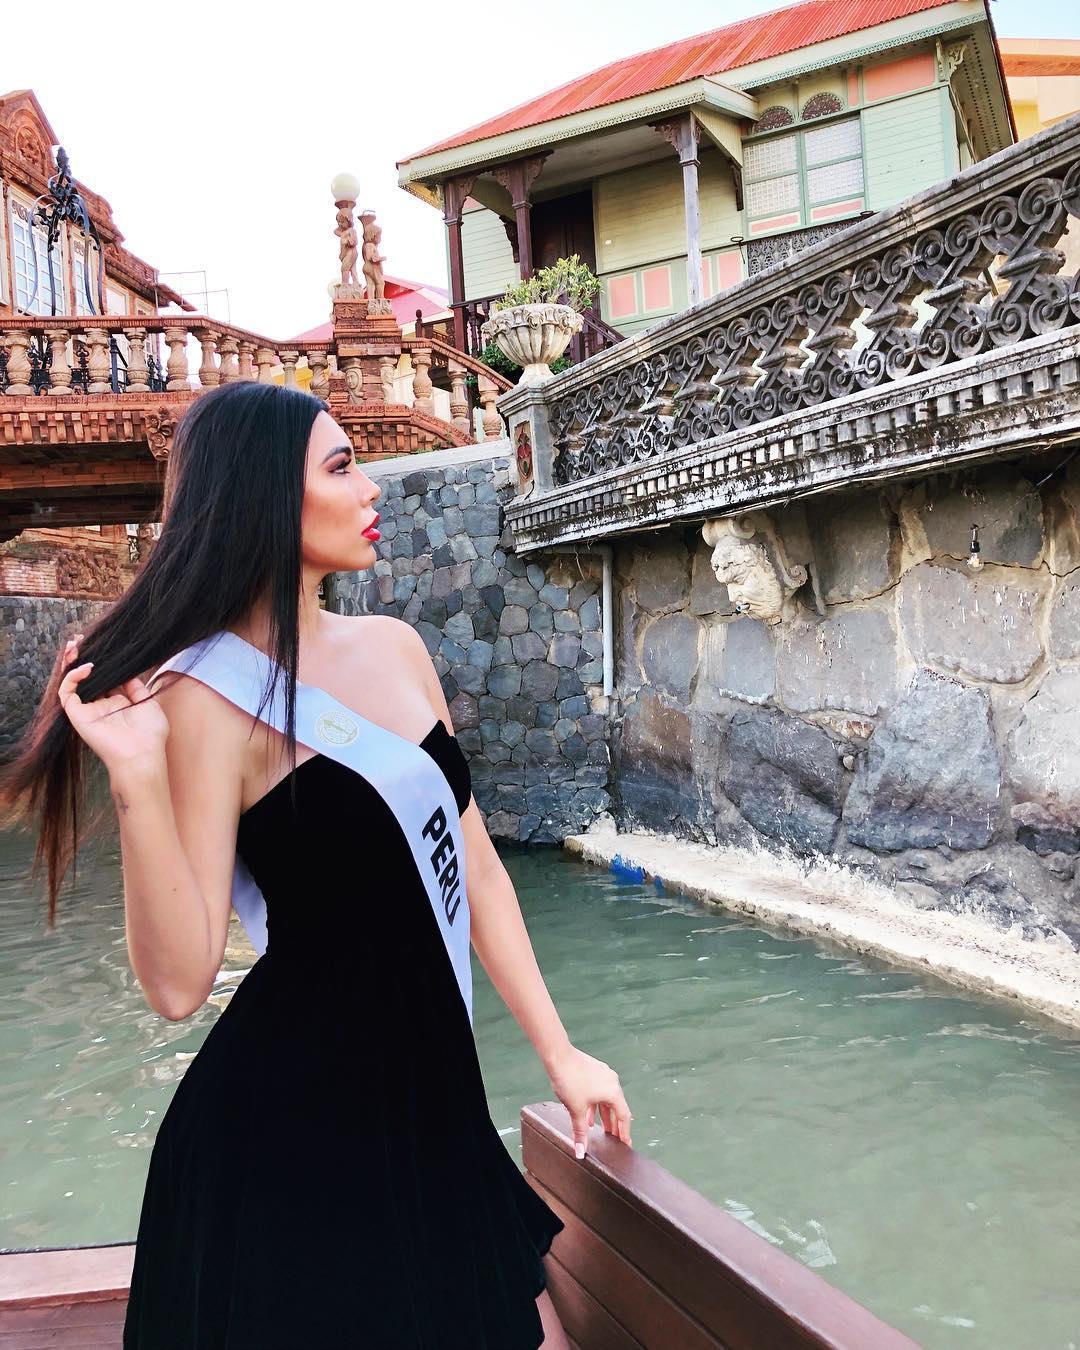 giuliana valenzuela, miss intercontinental peru 2018-2019. - Página 3 50481710